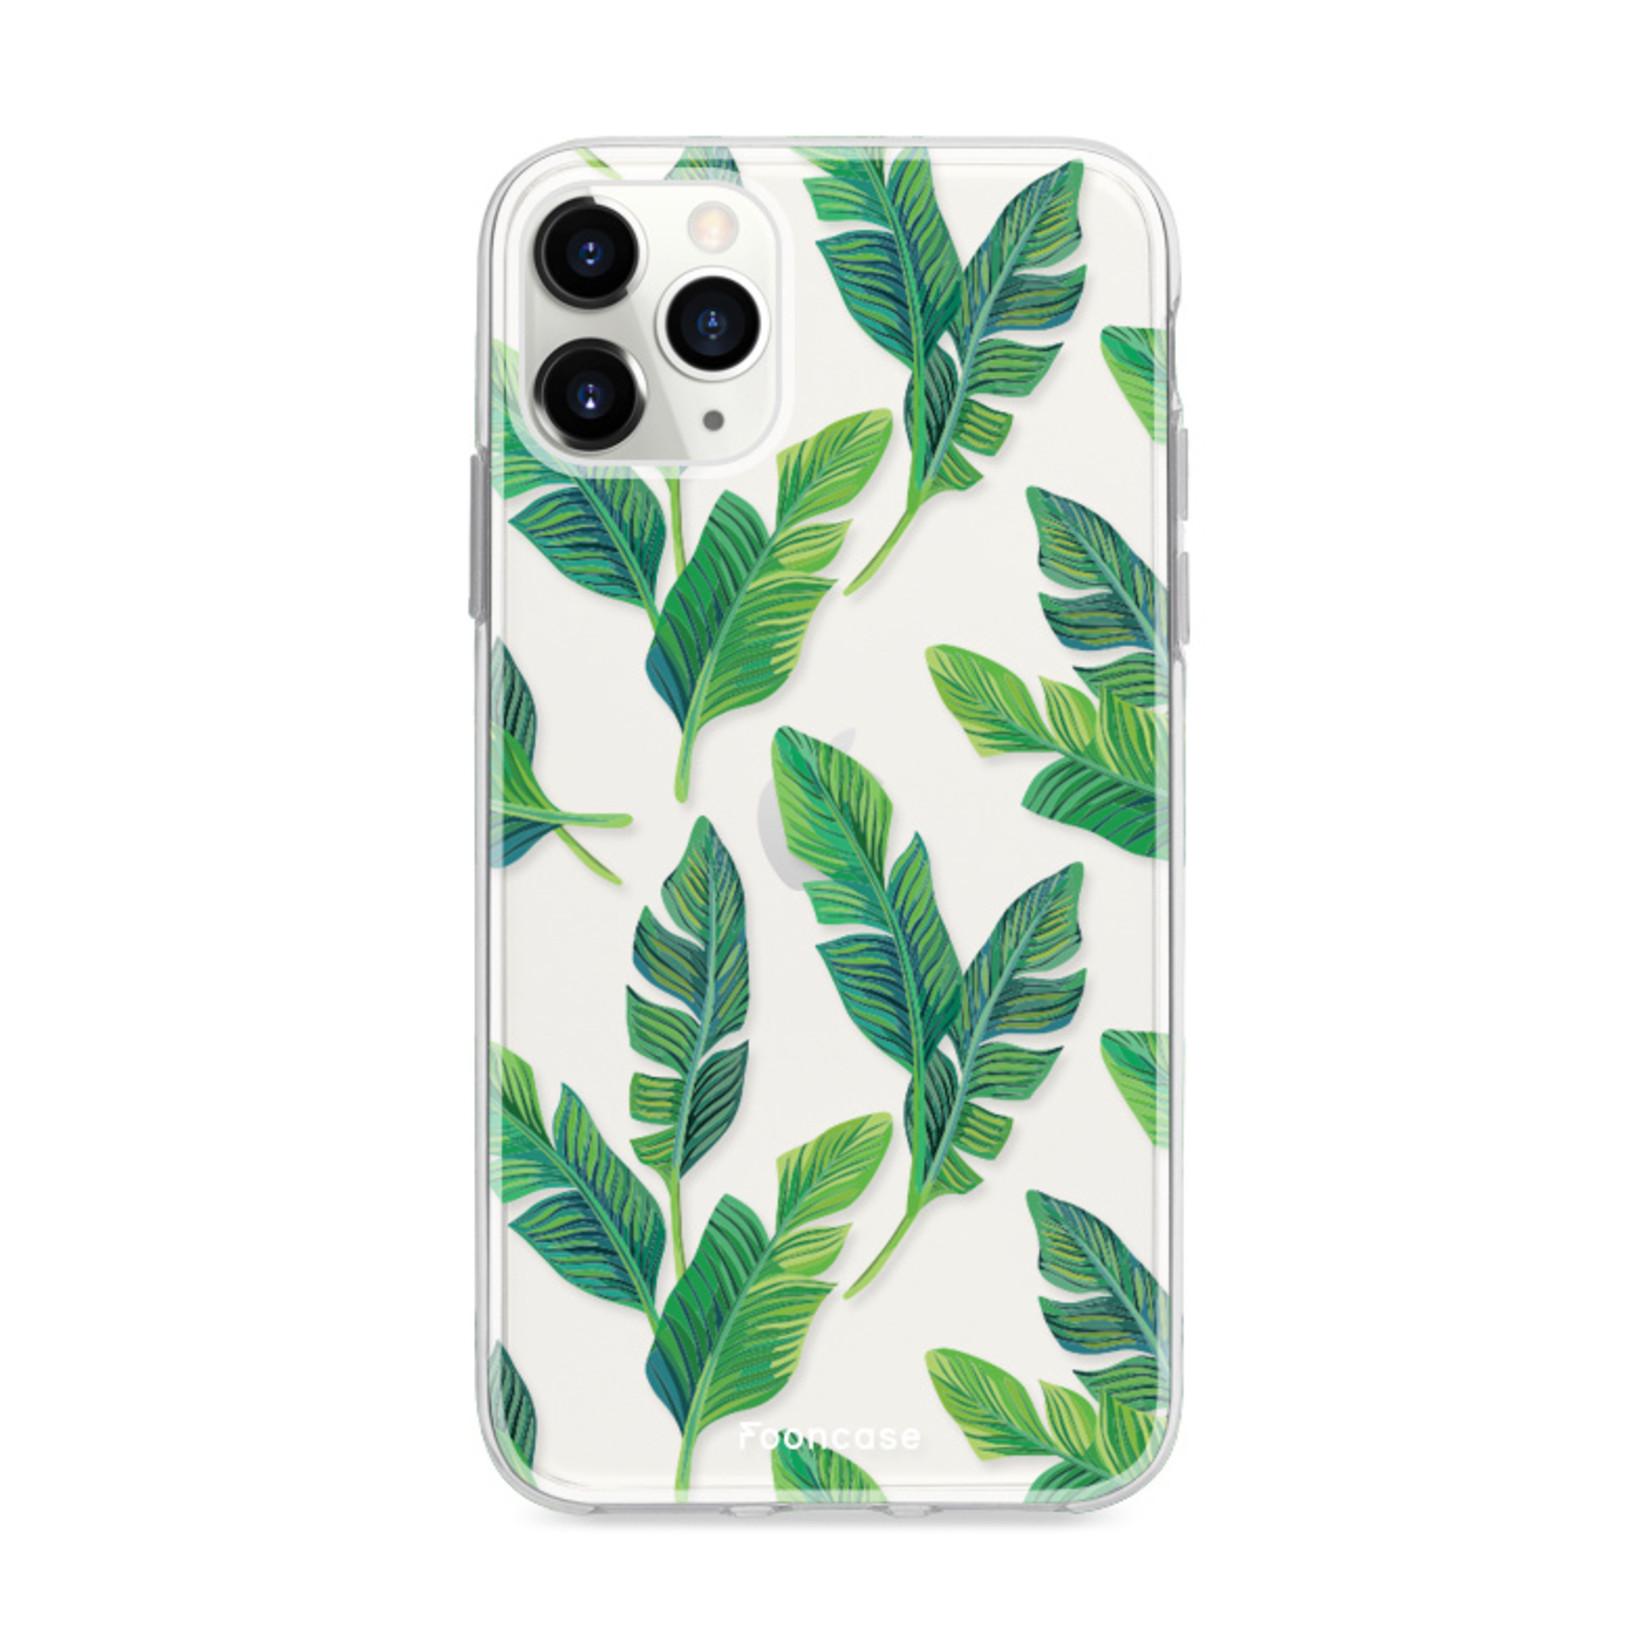 FOONCASE IPhone 11 Pro Handyhülle - Bananenblätter